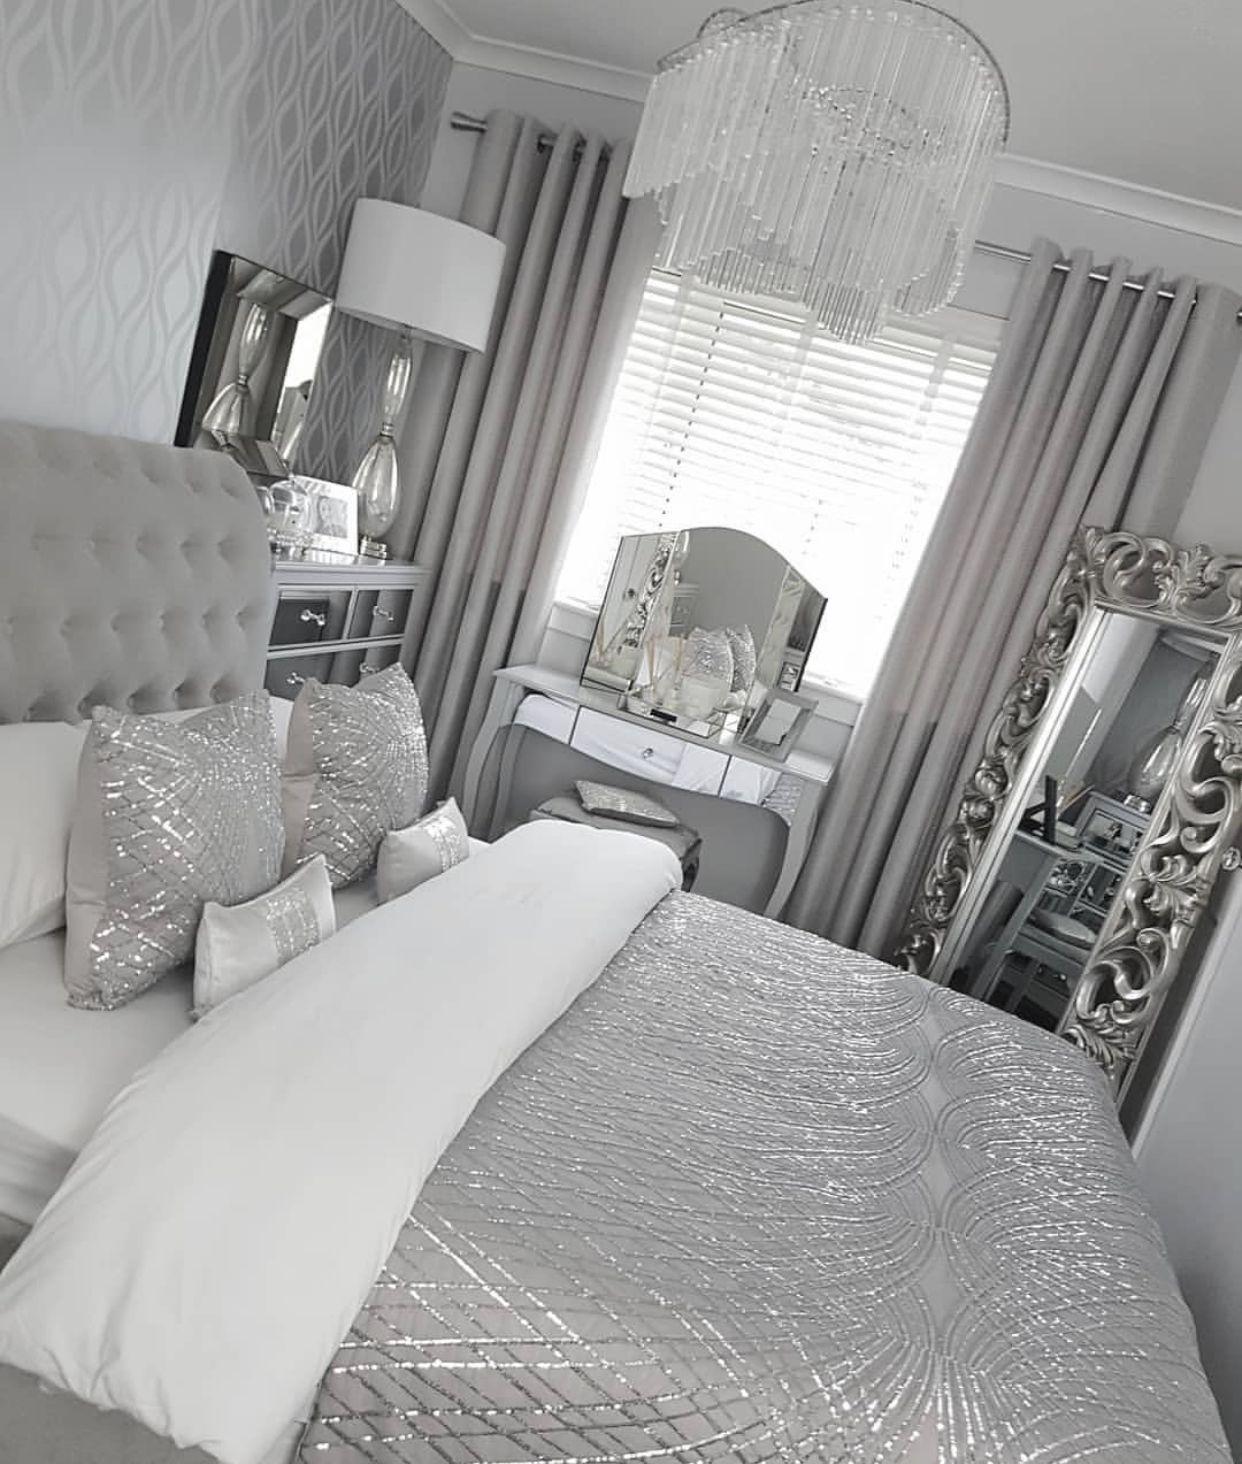 Pin By M Wizst On Cute Bedroom Ideas Silver Bedroom Decor